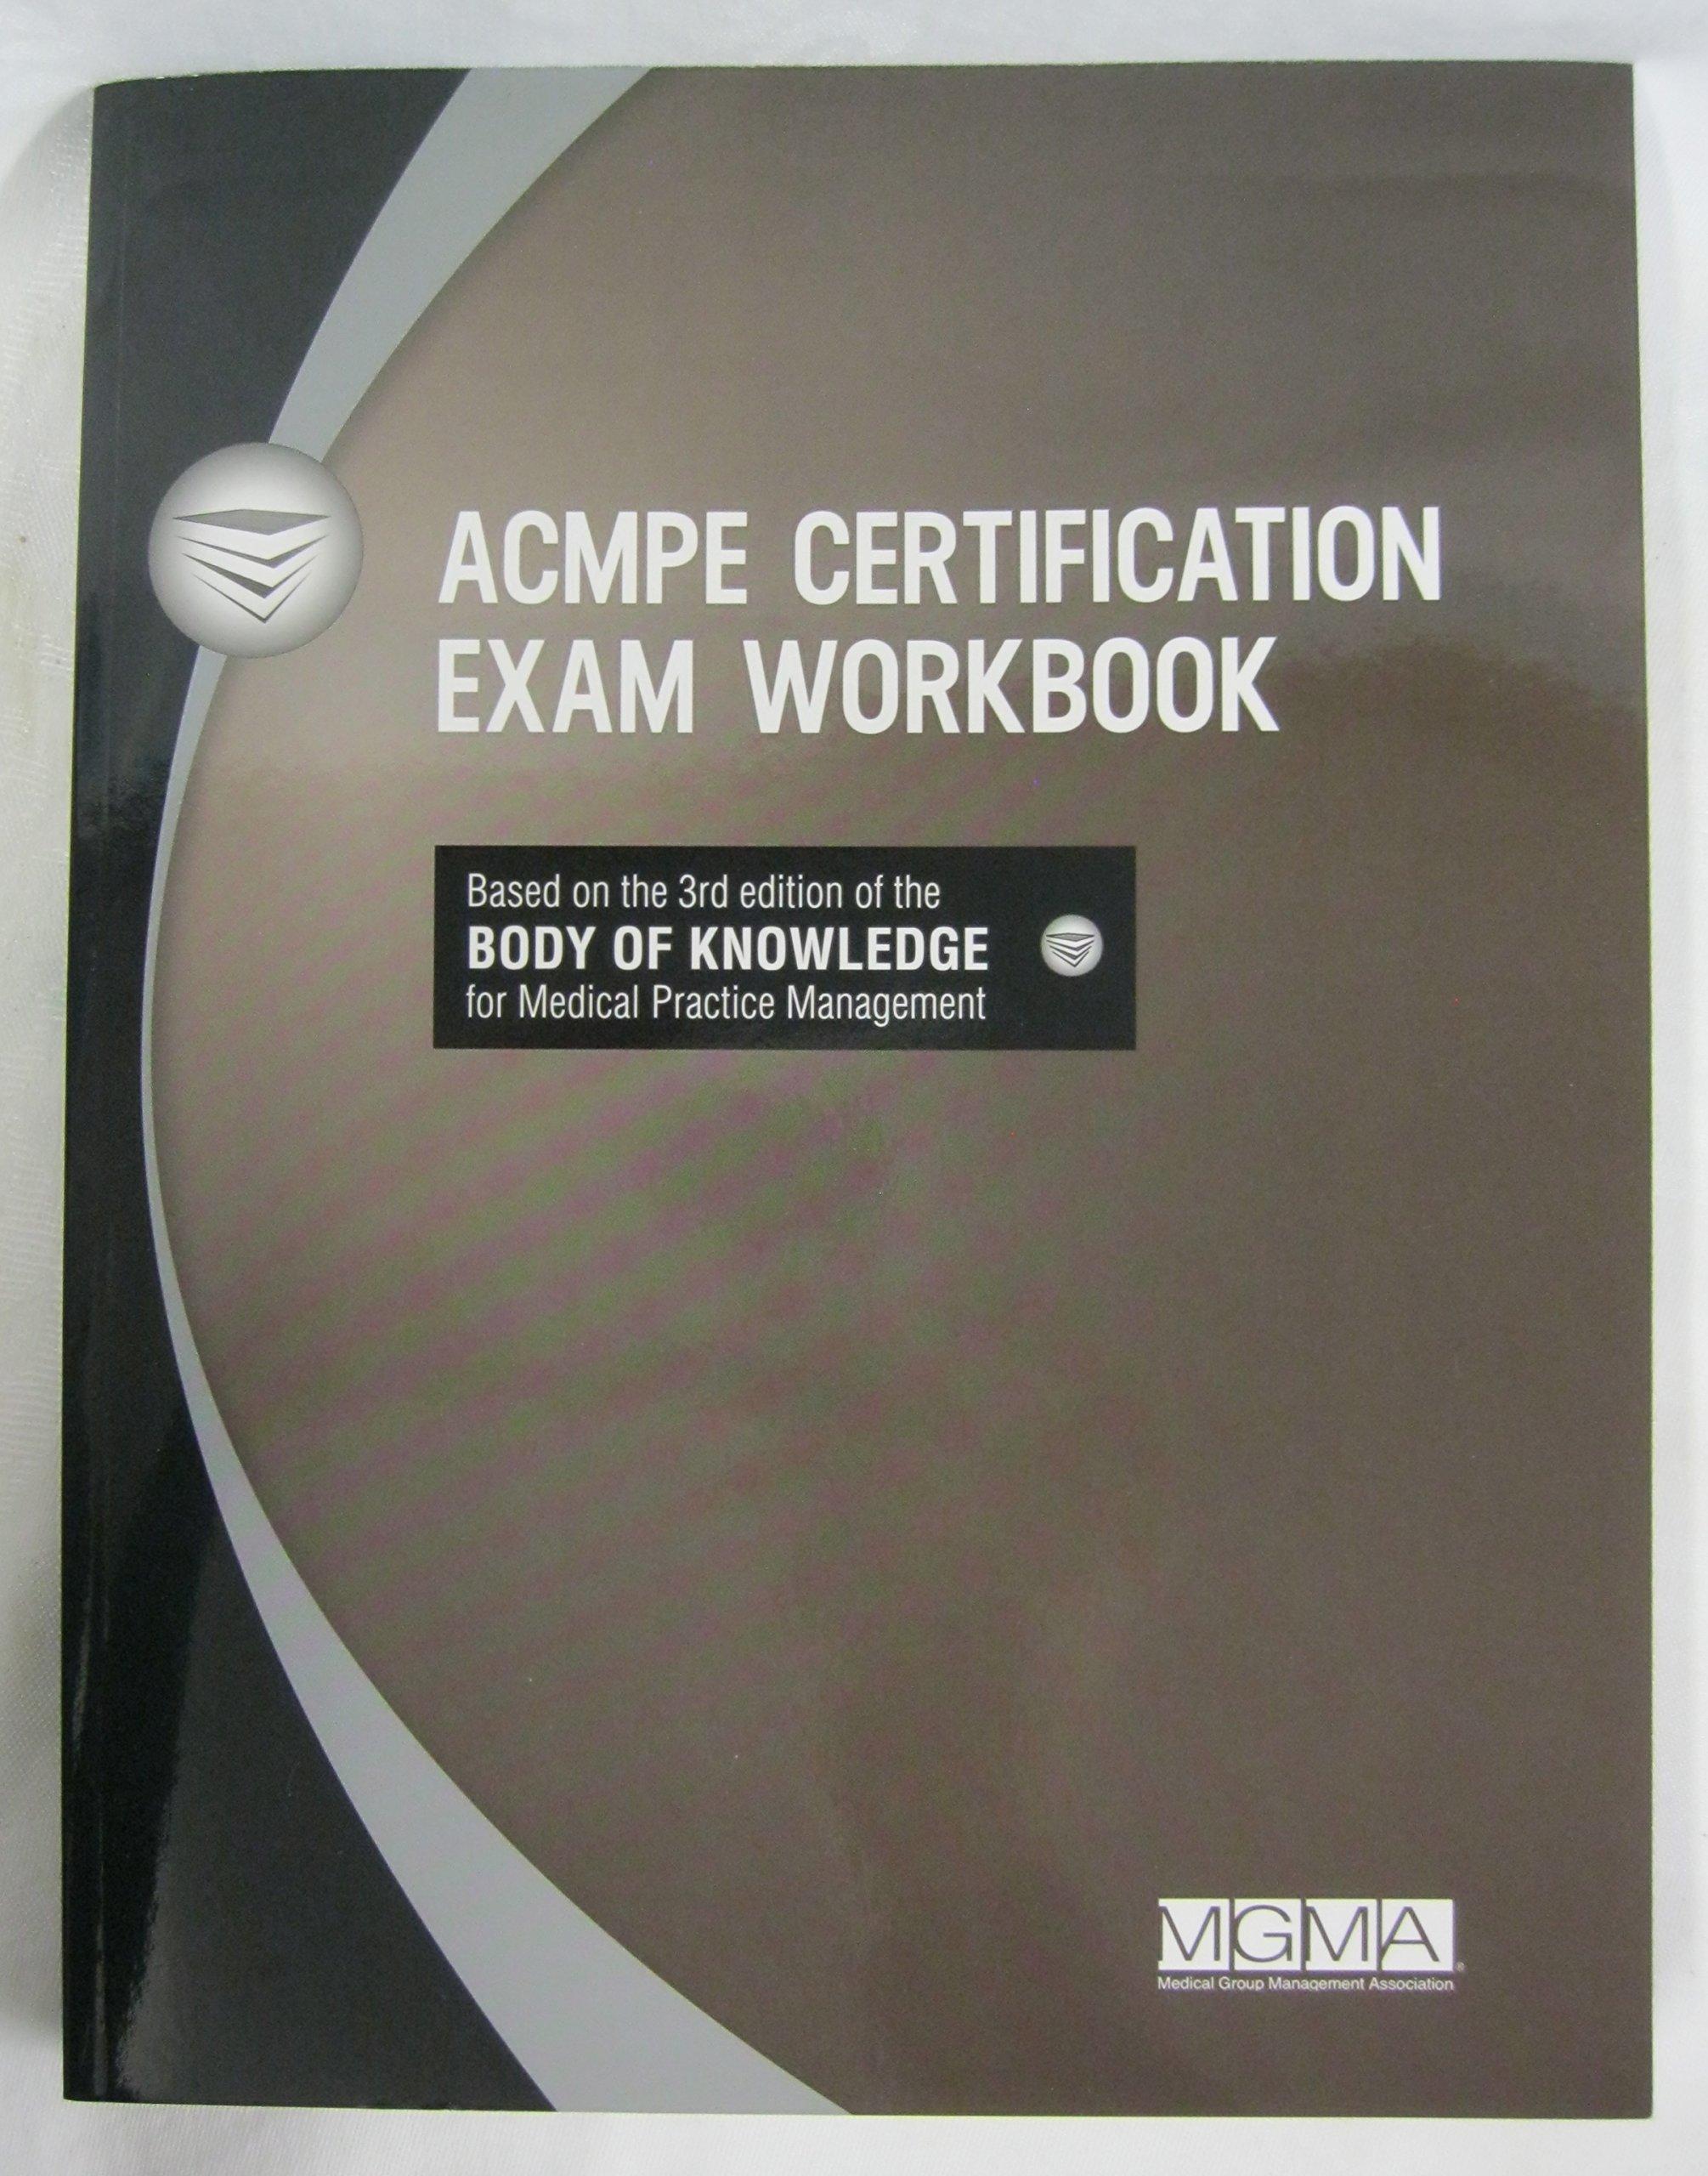 Acmpe Certification Exam Workbook Mgma 9781568294865 Amazon